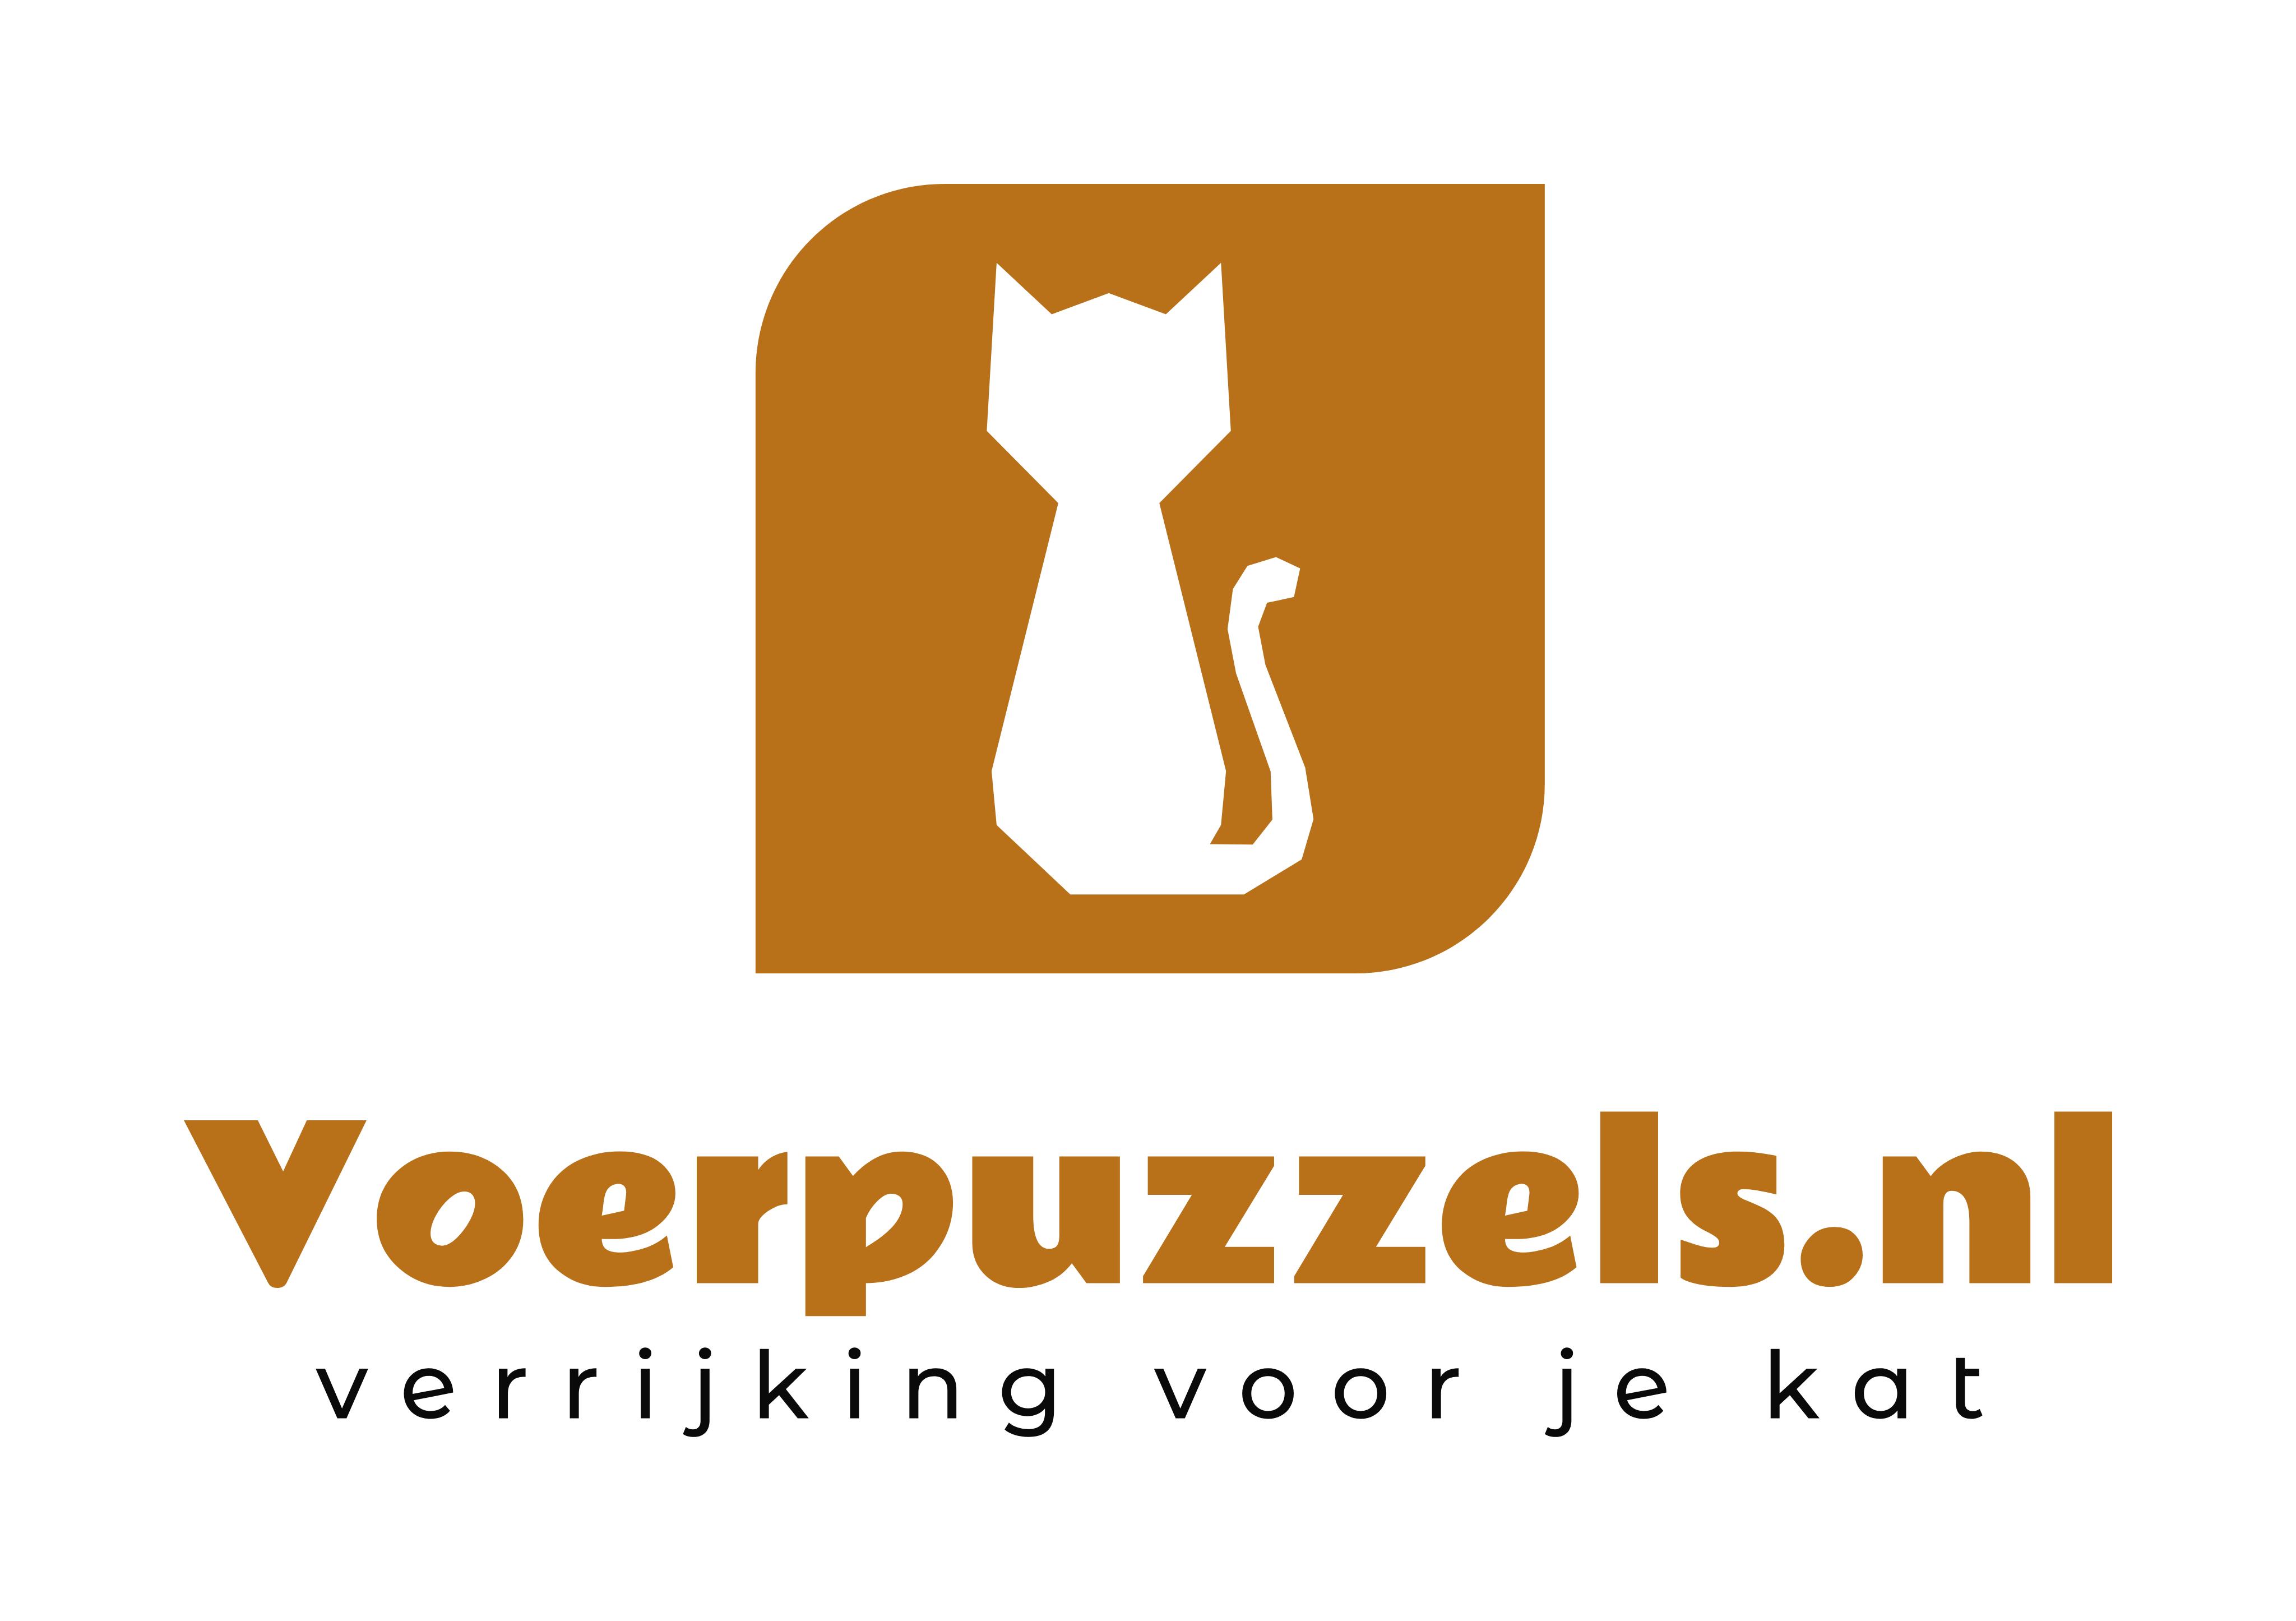 Voerpuzzels.nl